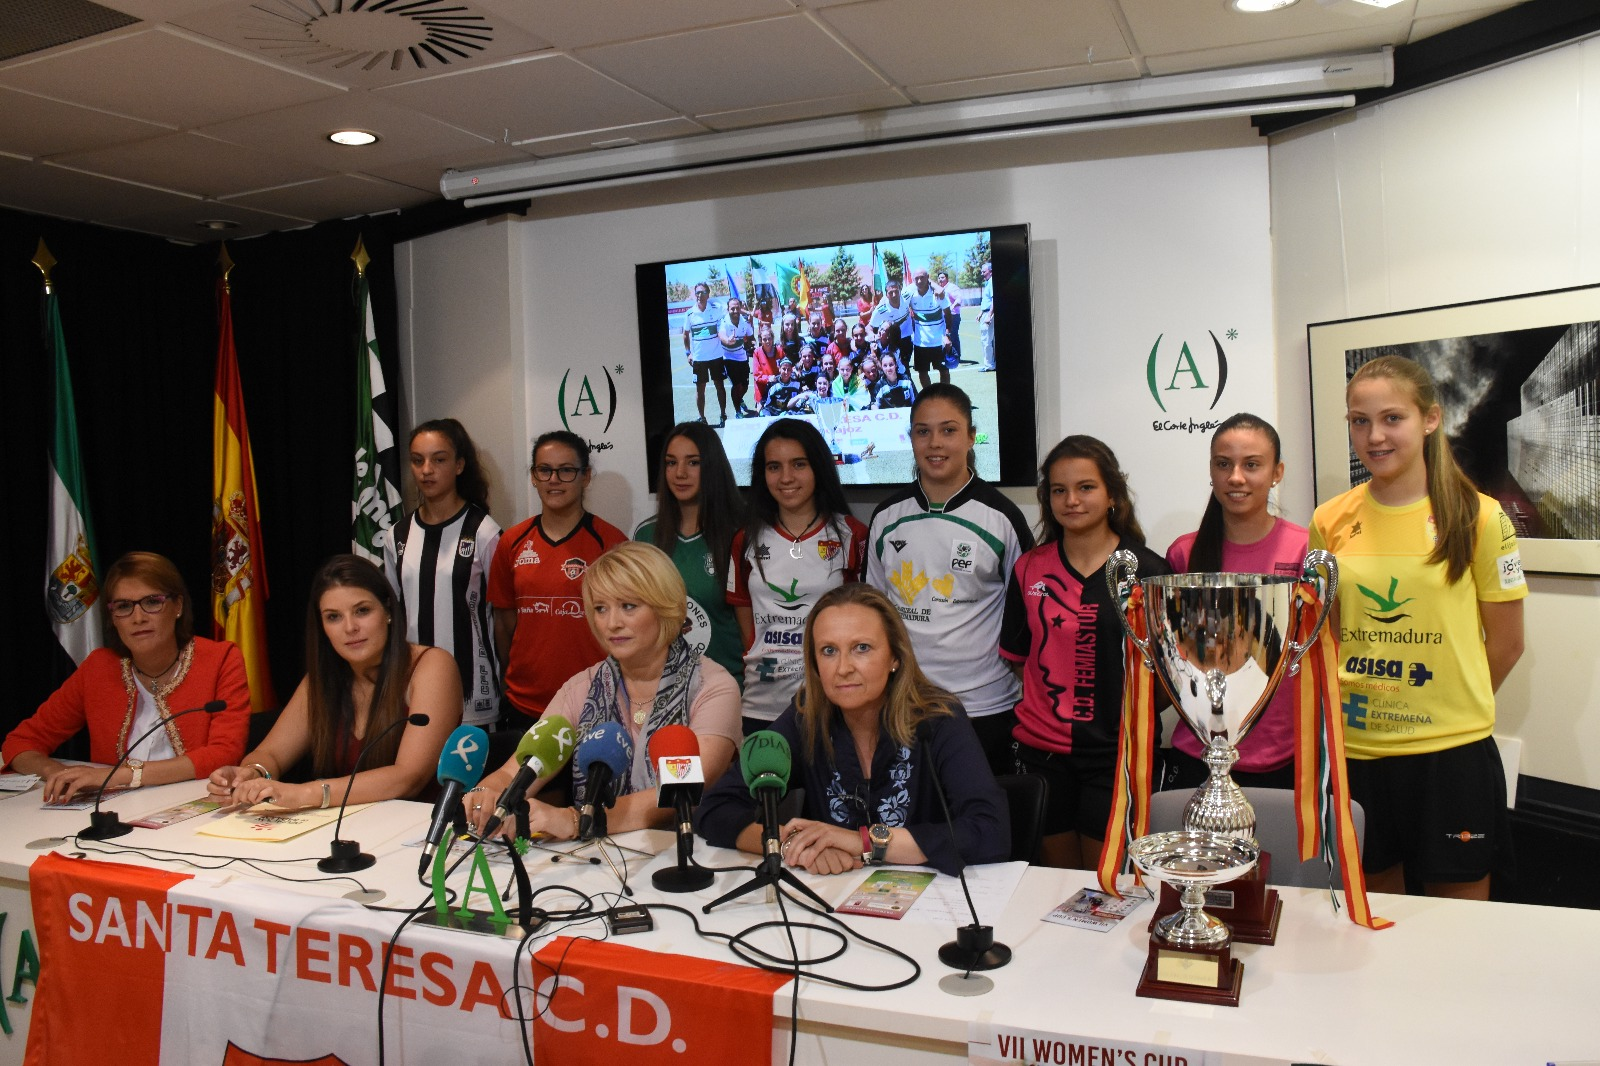 Presentacion Womens Cup 2017 1